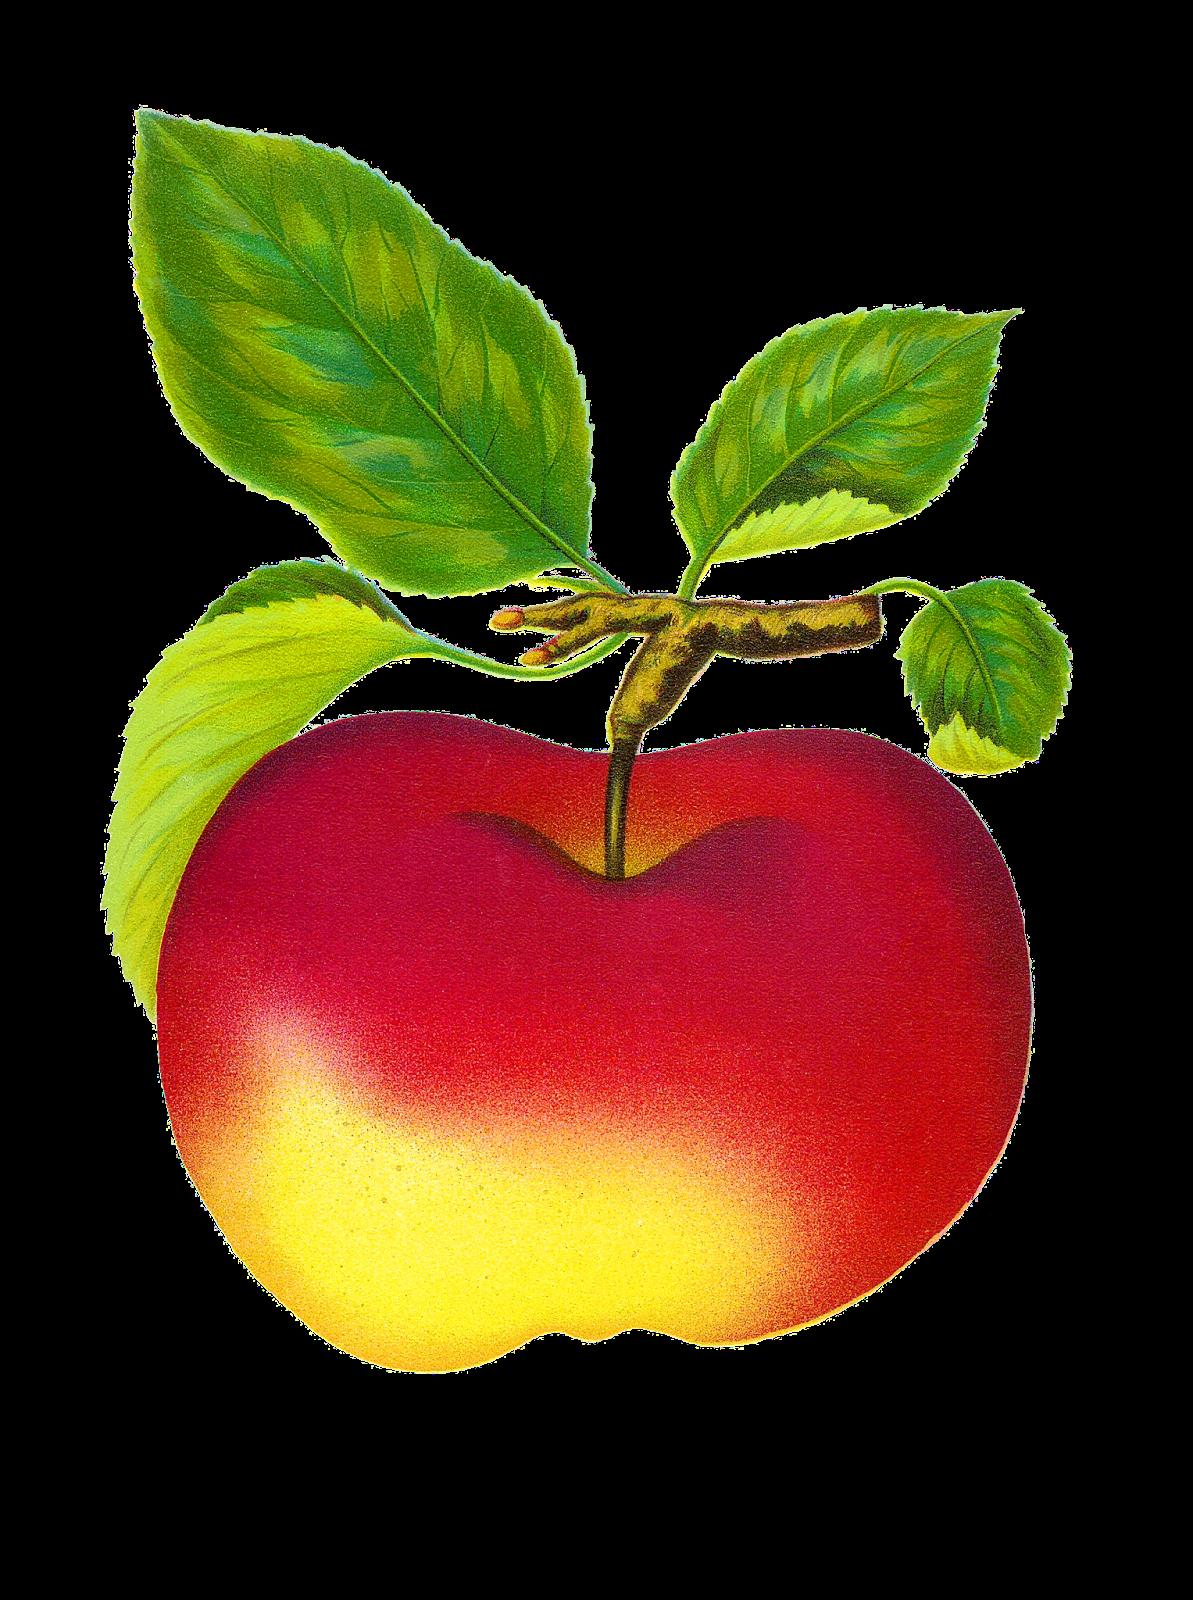 Free Digital Vintage Fruit Red Apple Graphics Beitigheimer